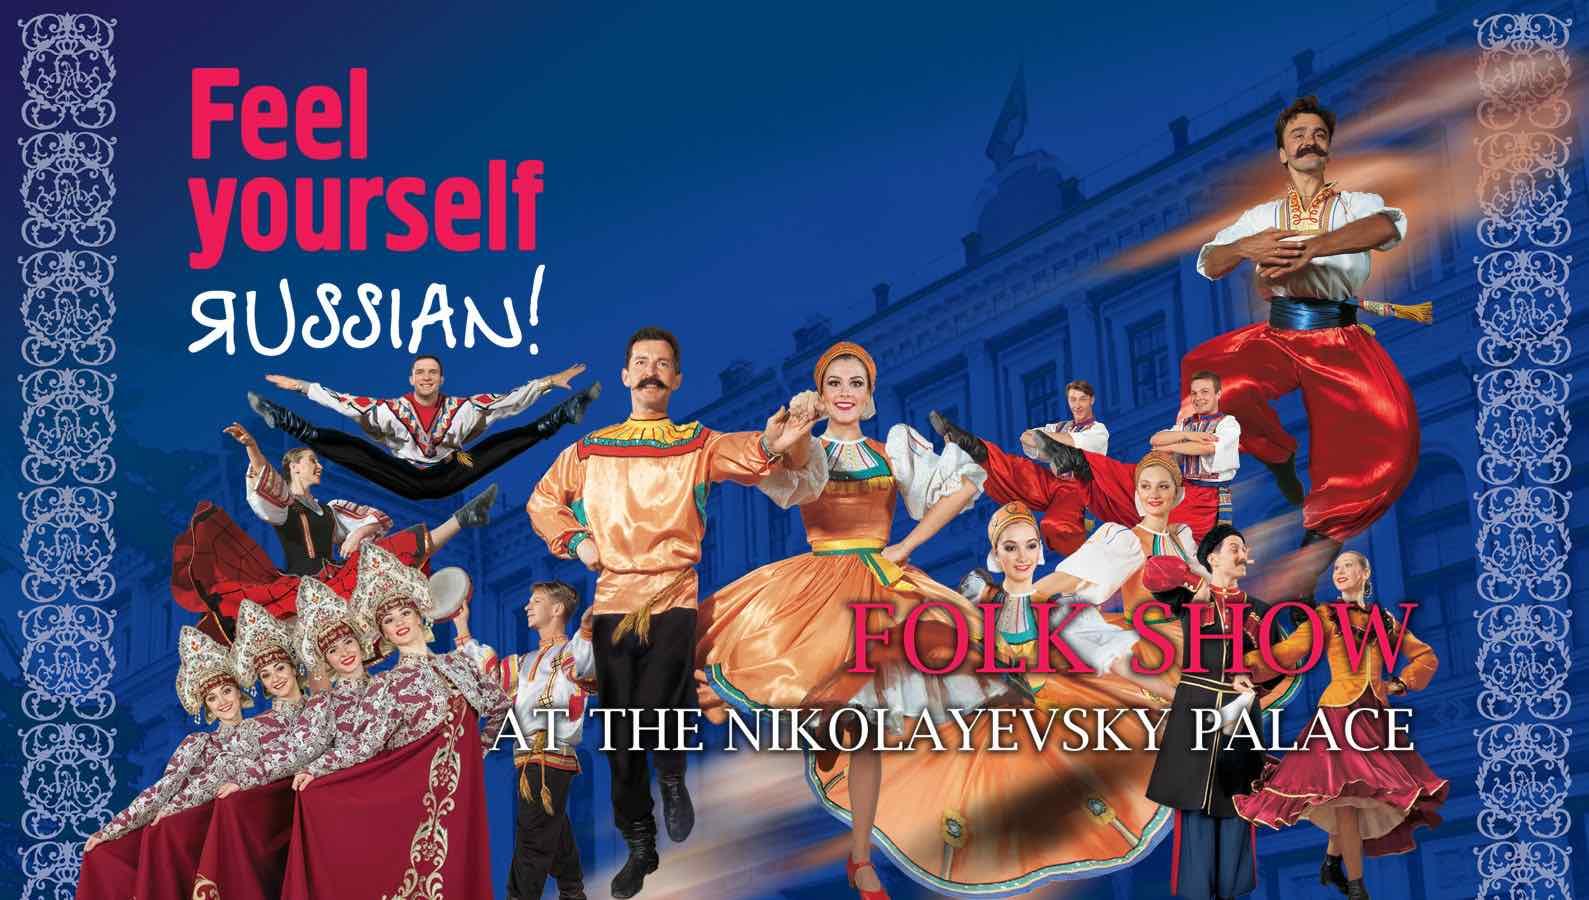 Feel-yourself-Russian-Folk-Show-St Petersburg